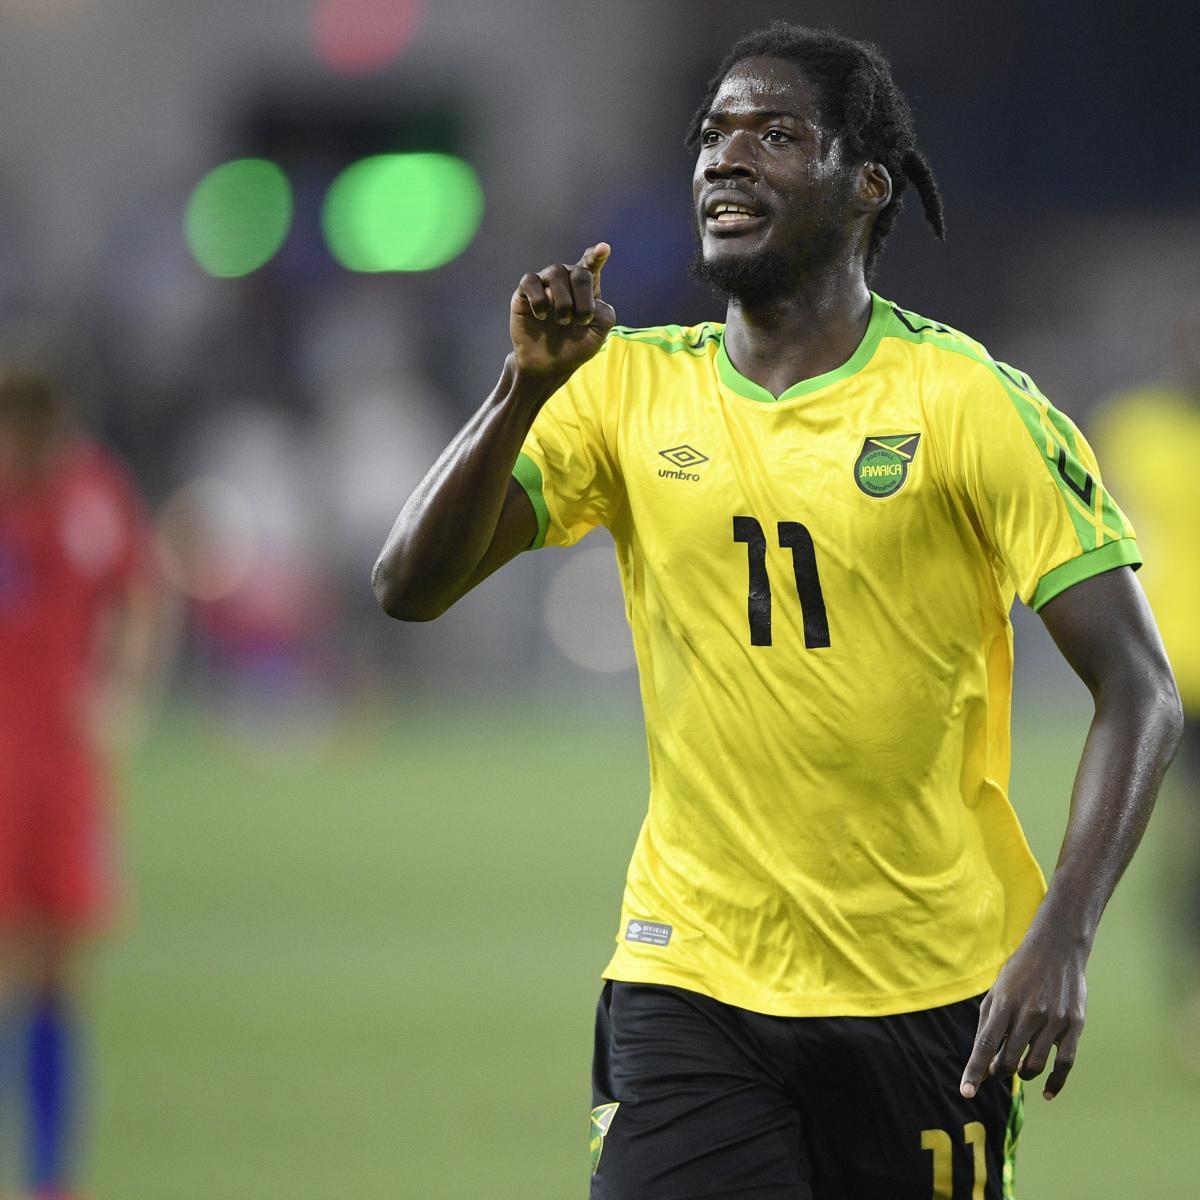 Shamar Nicholson Leads Jamaica To 1-0 Win Over United